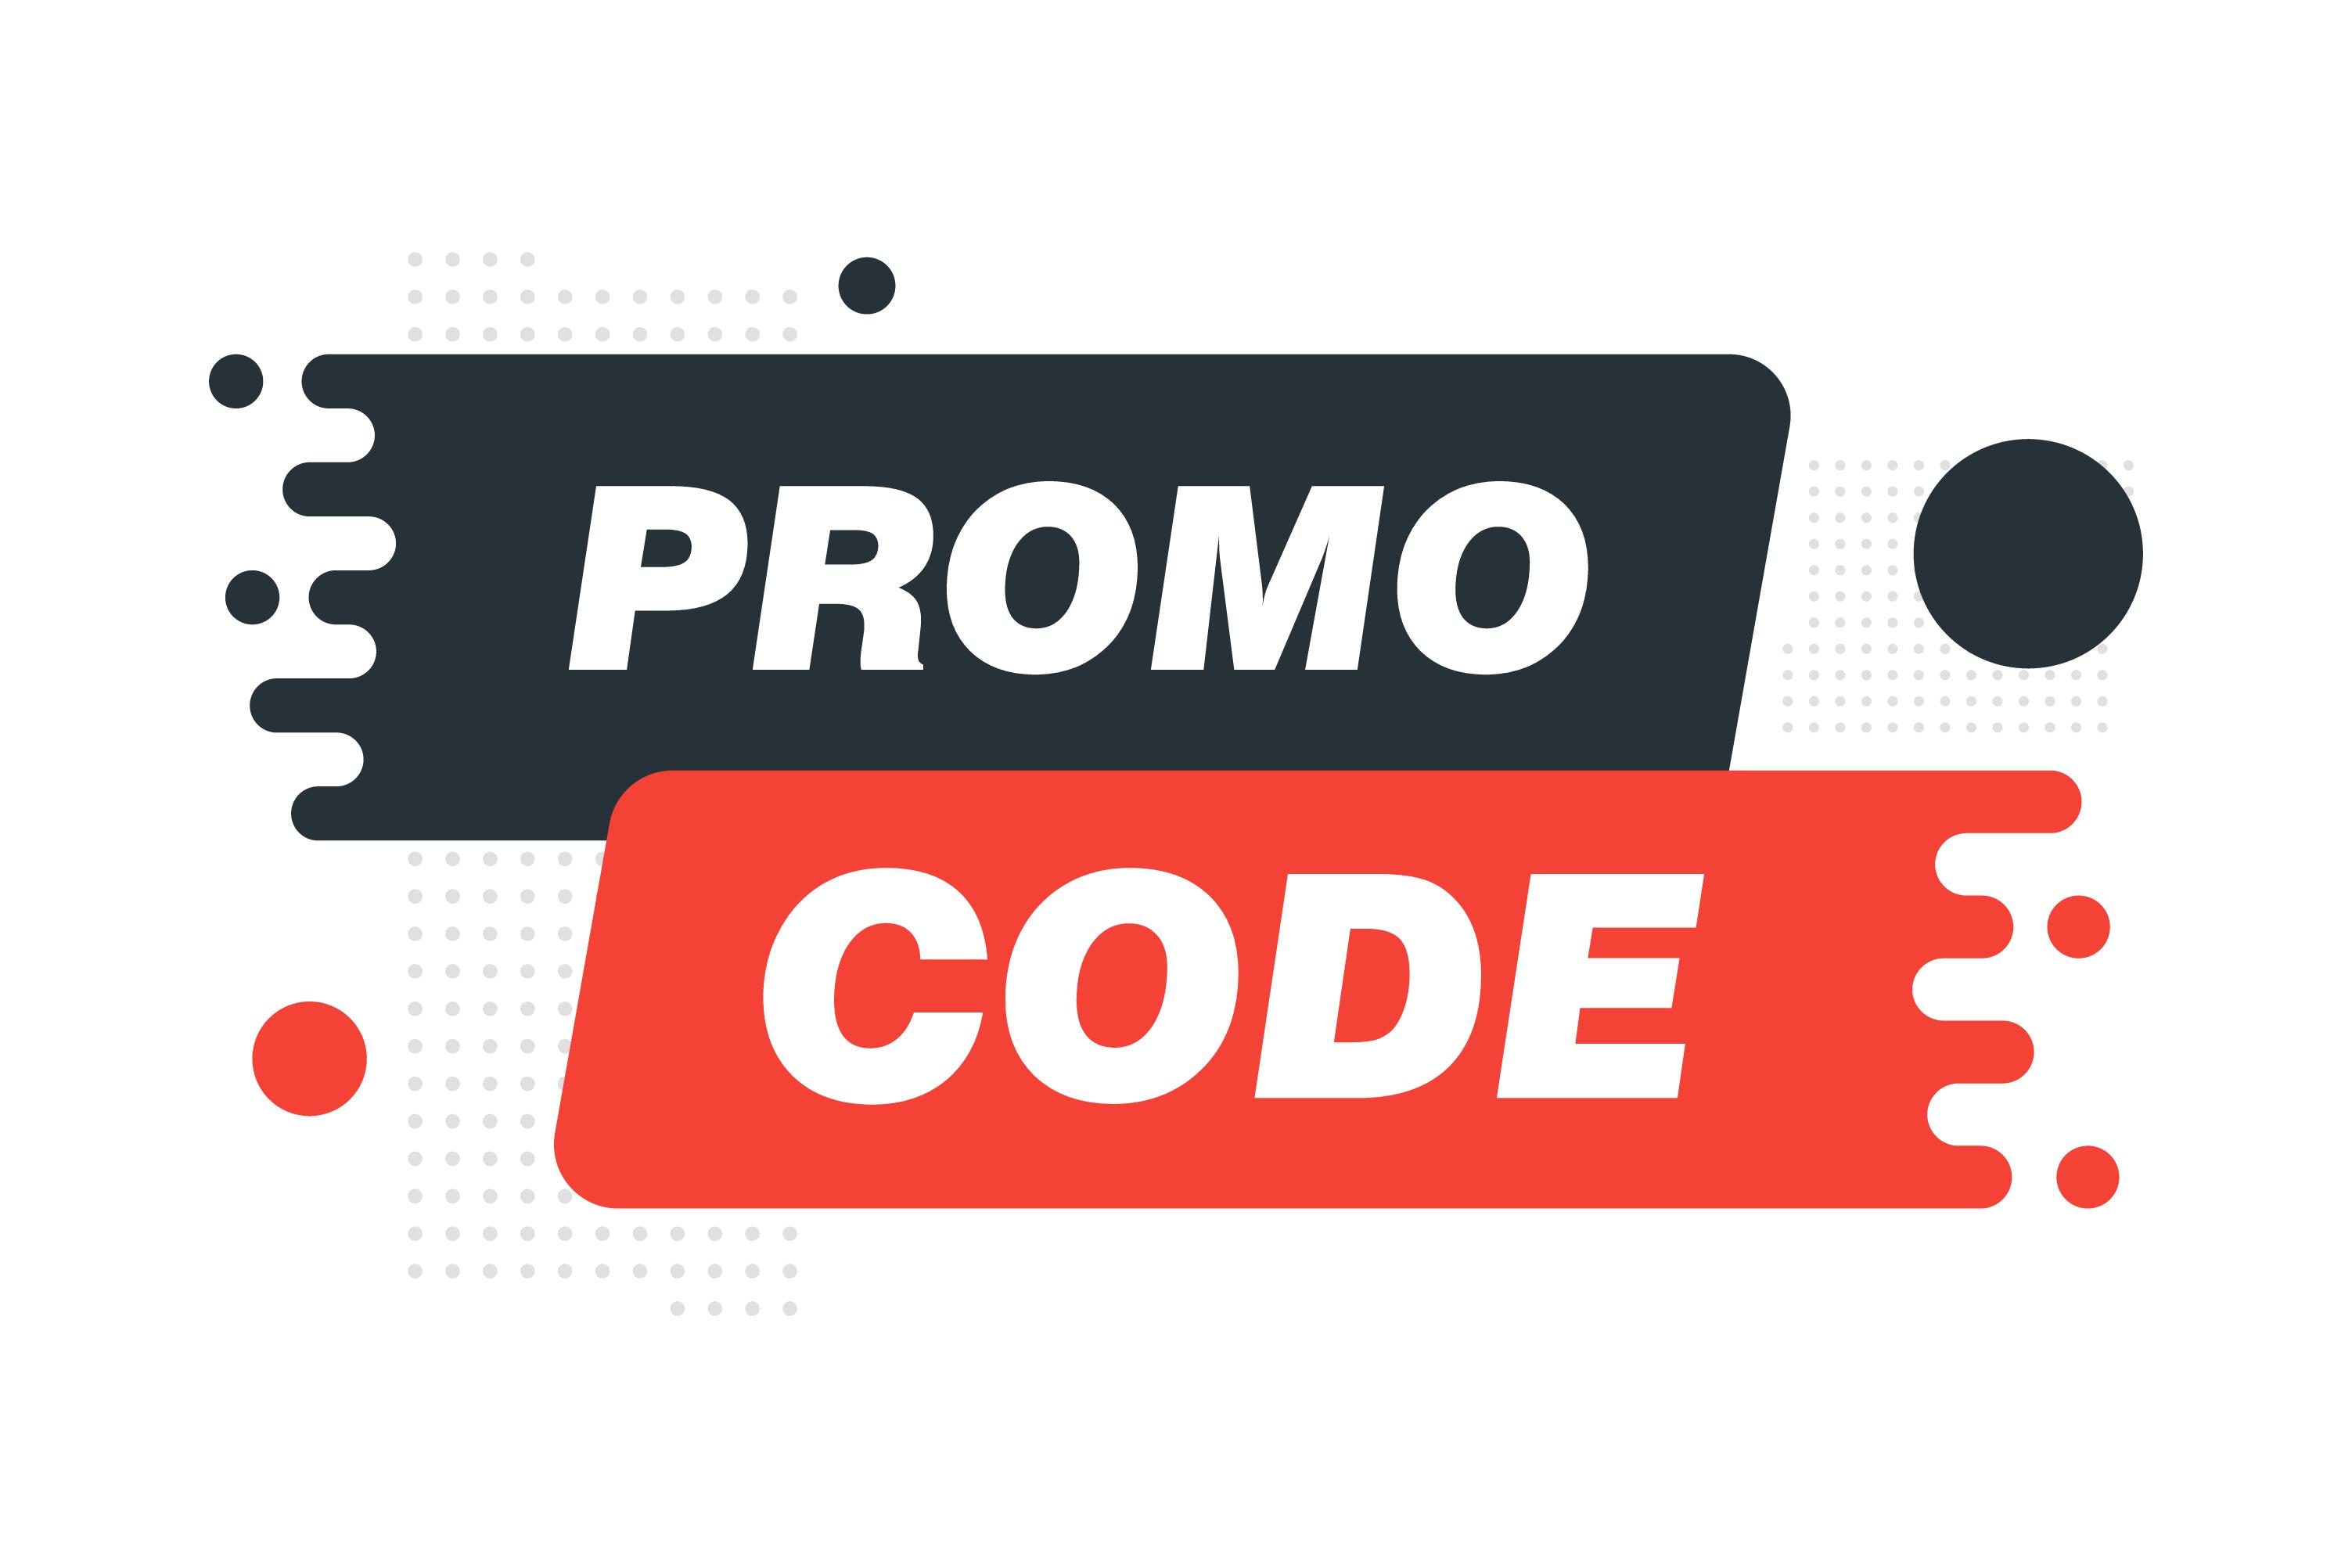 sportsbook deposit bonus promo codes